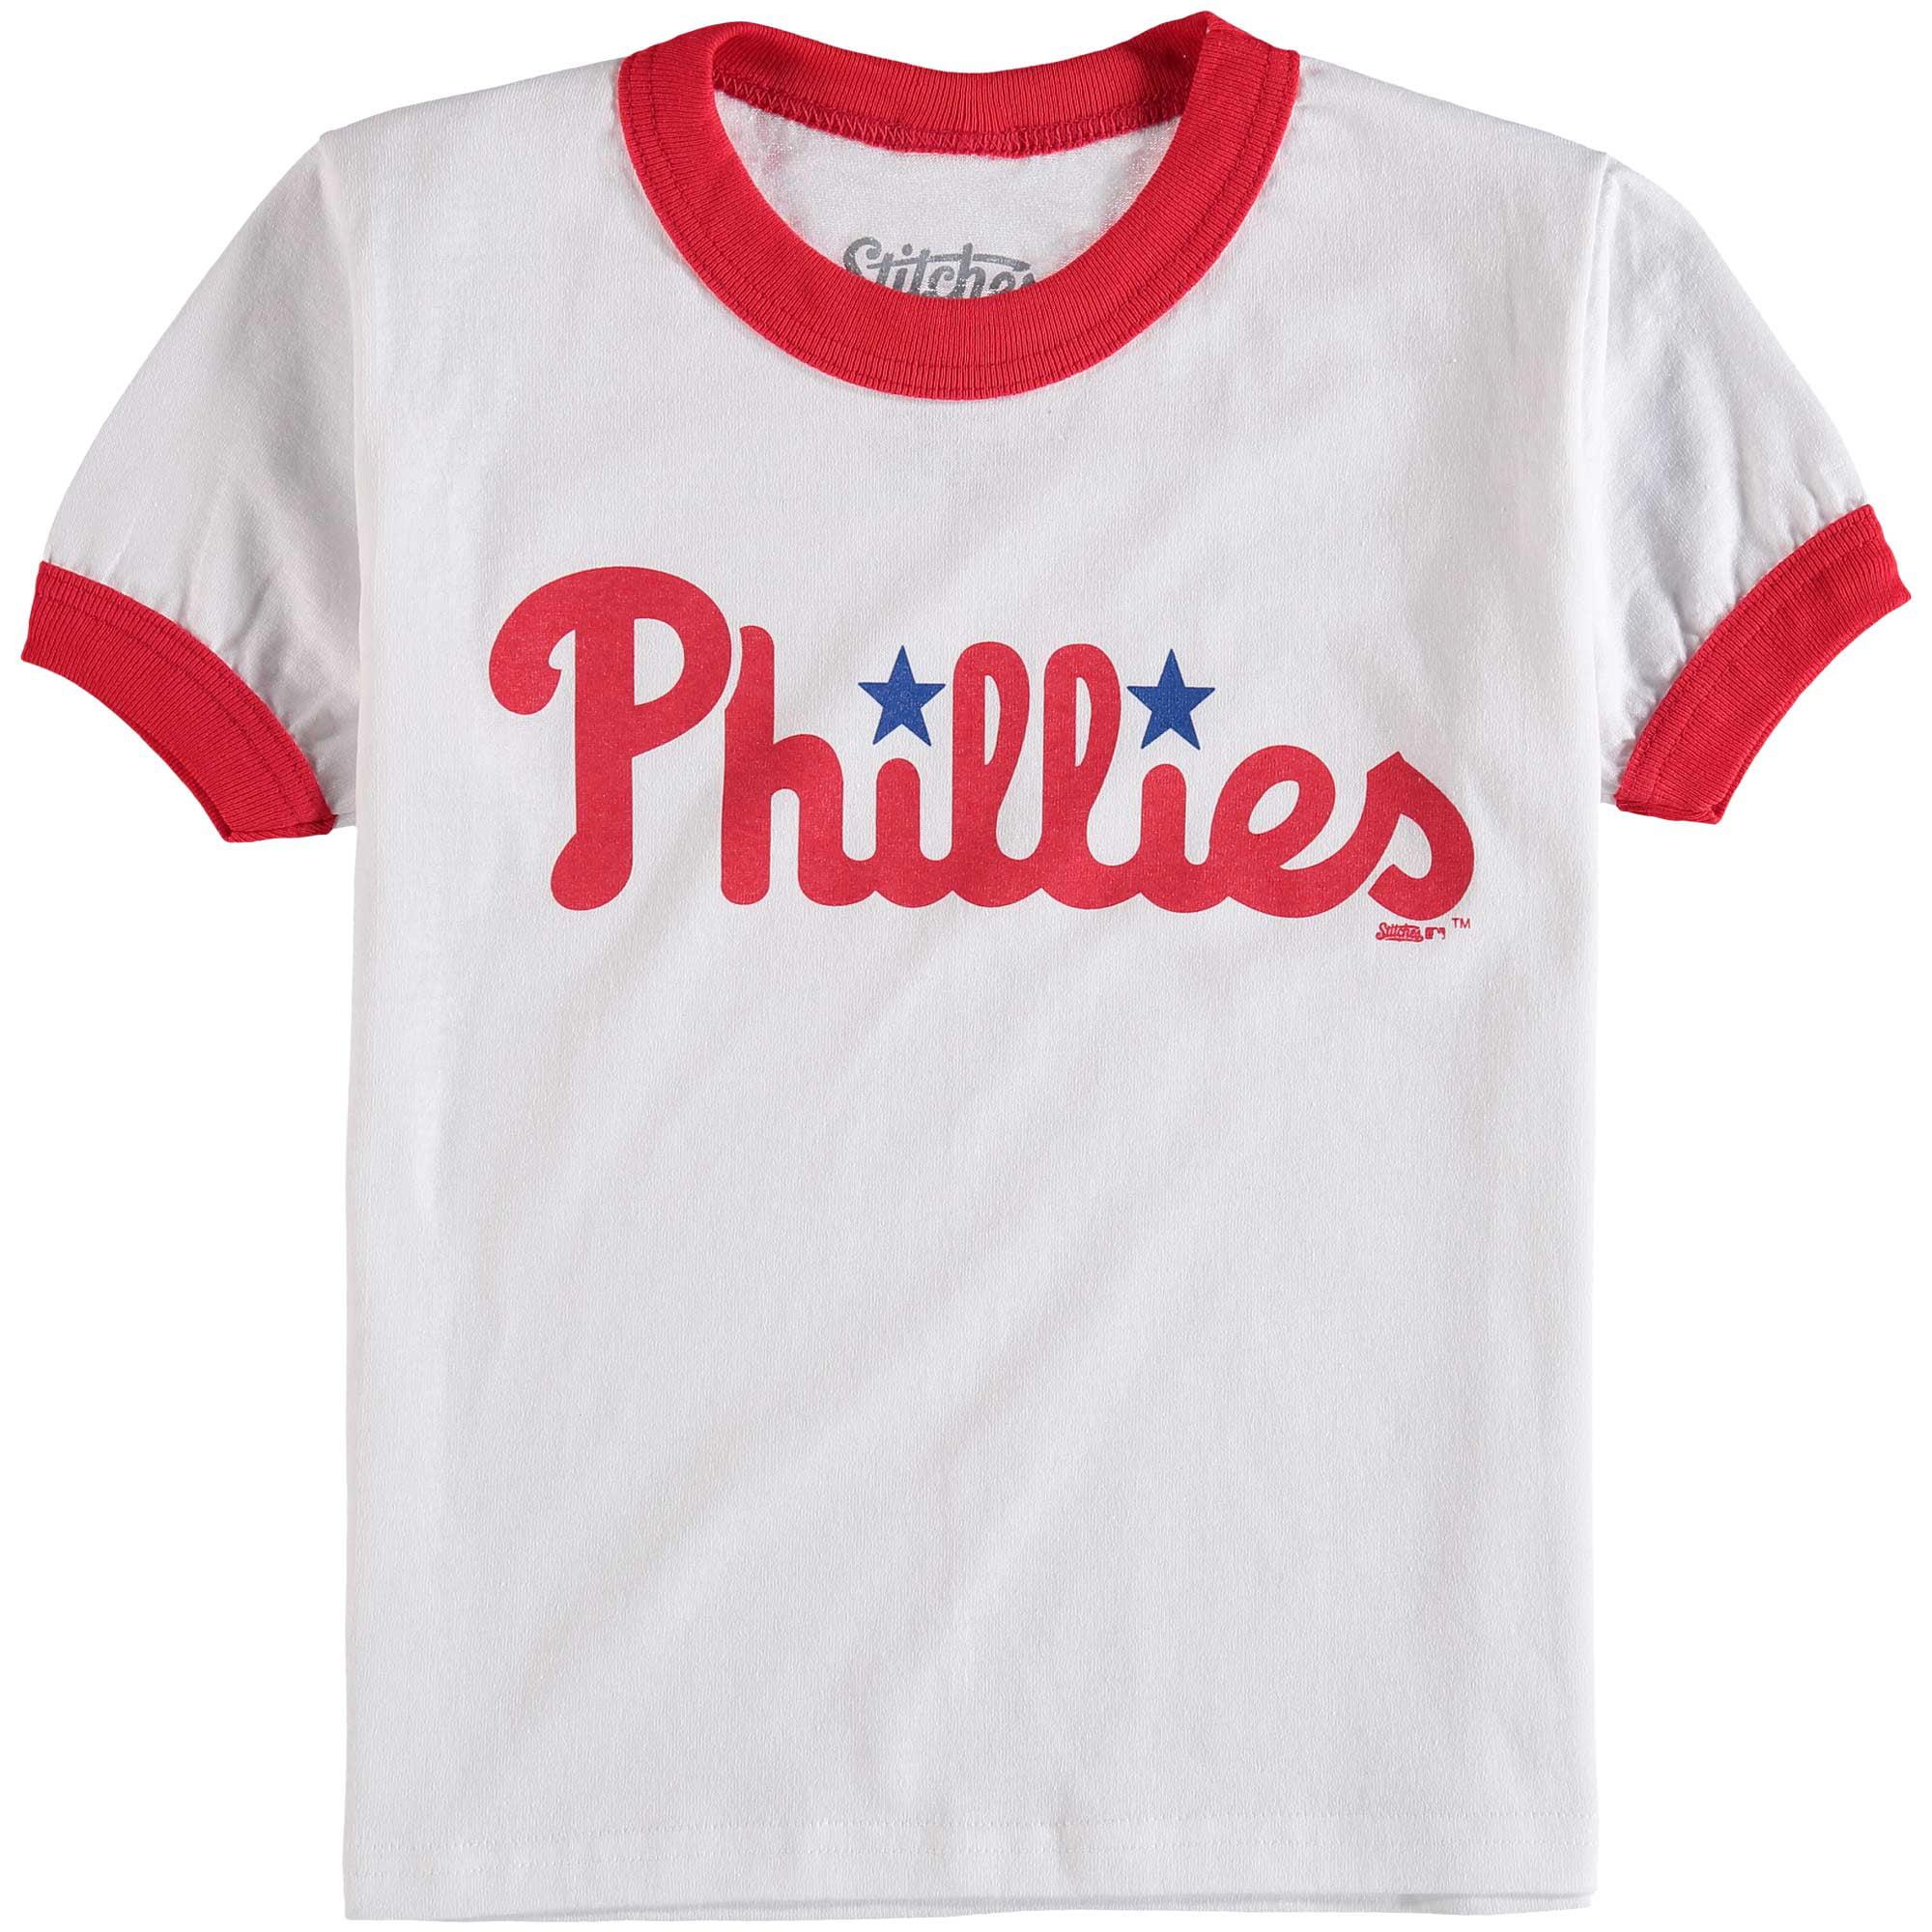 Philadelphia Phillies Stitches Youth Ringer T-Shirt - White/Red